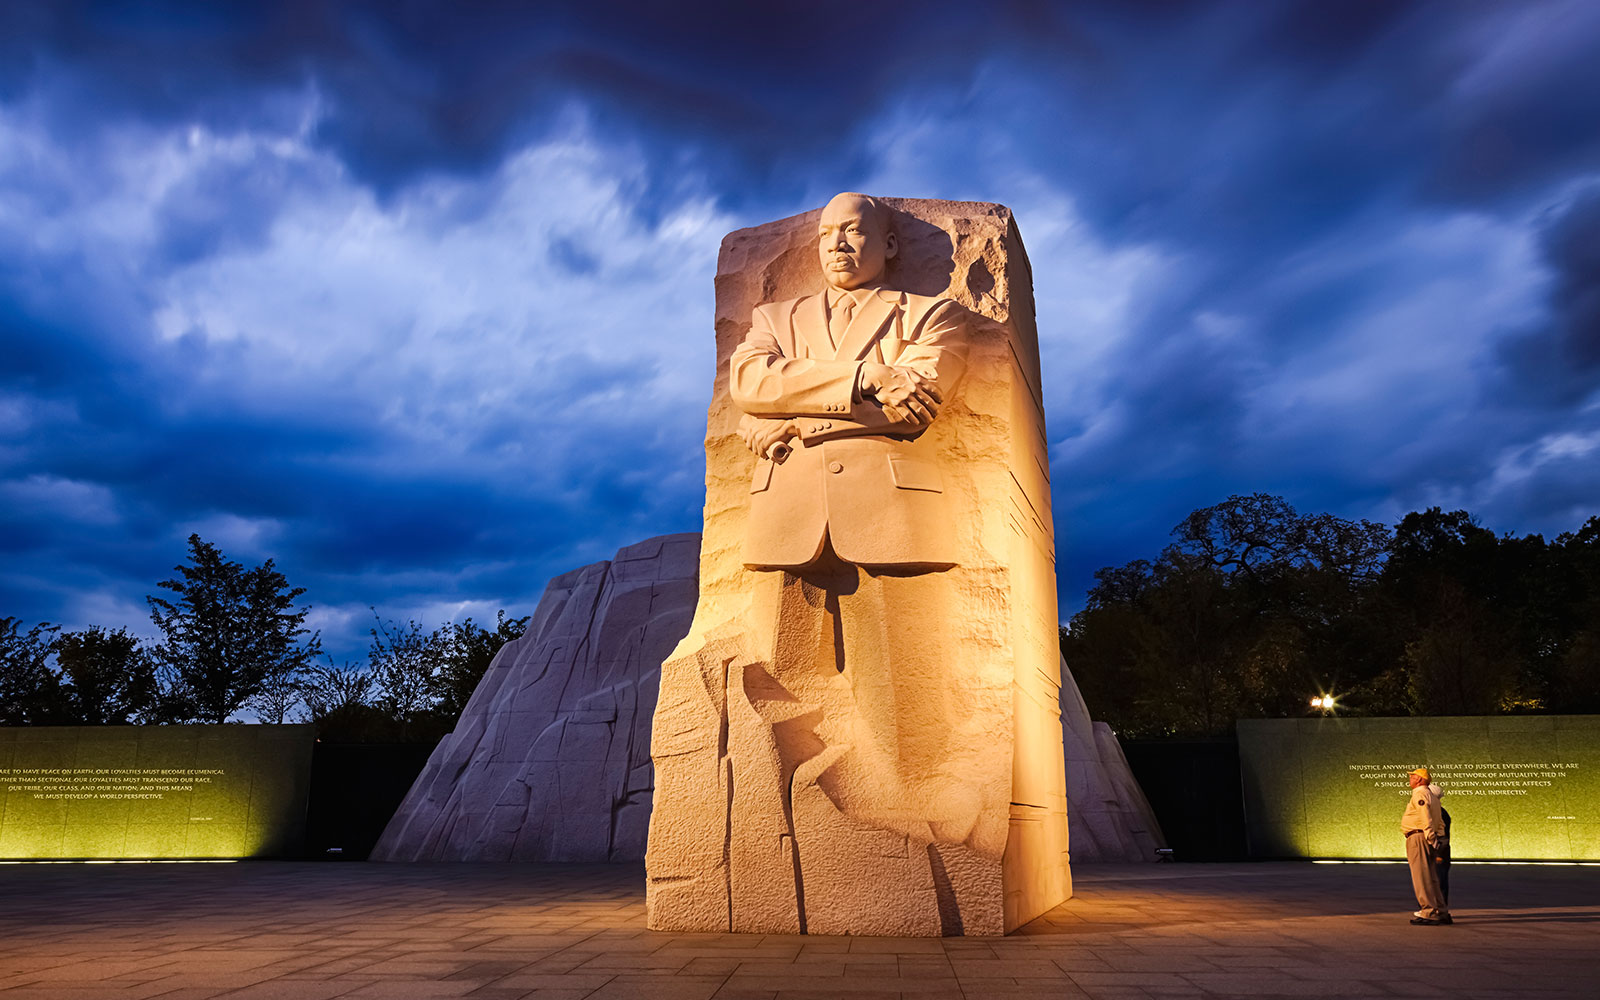 Martin Luther King, Jr Memorial at Washington